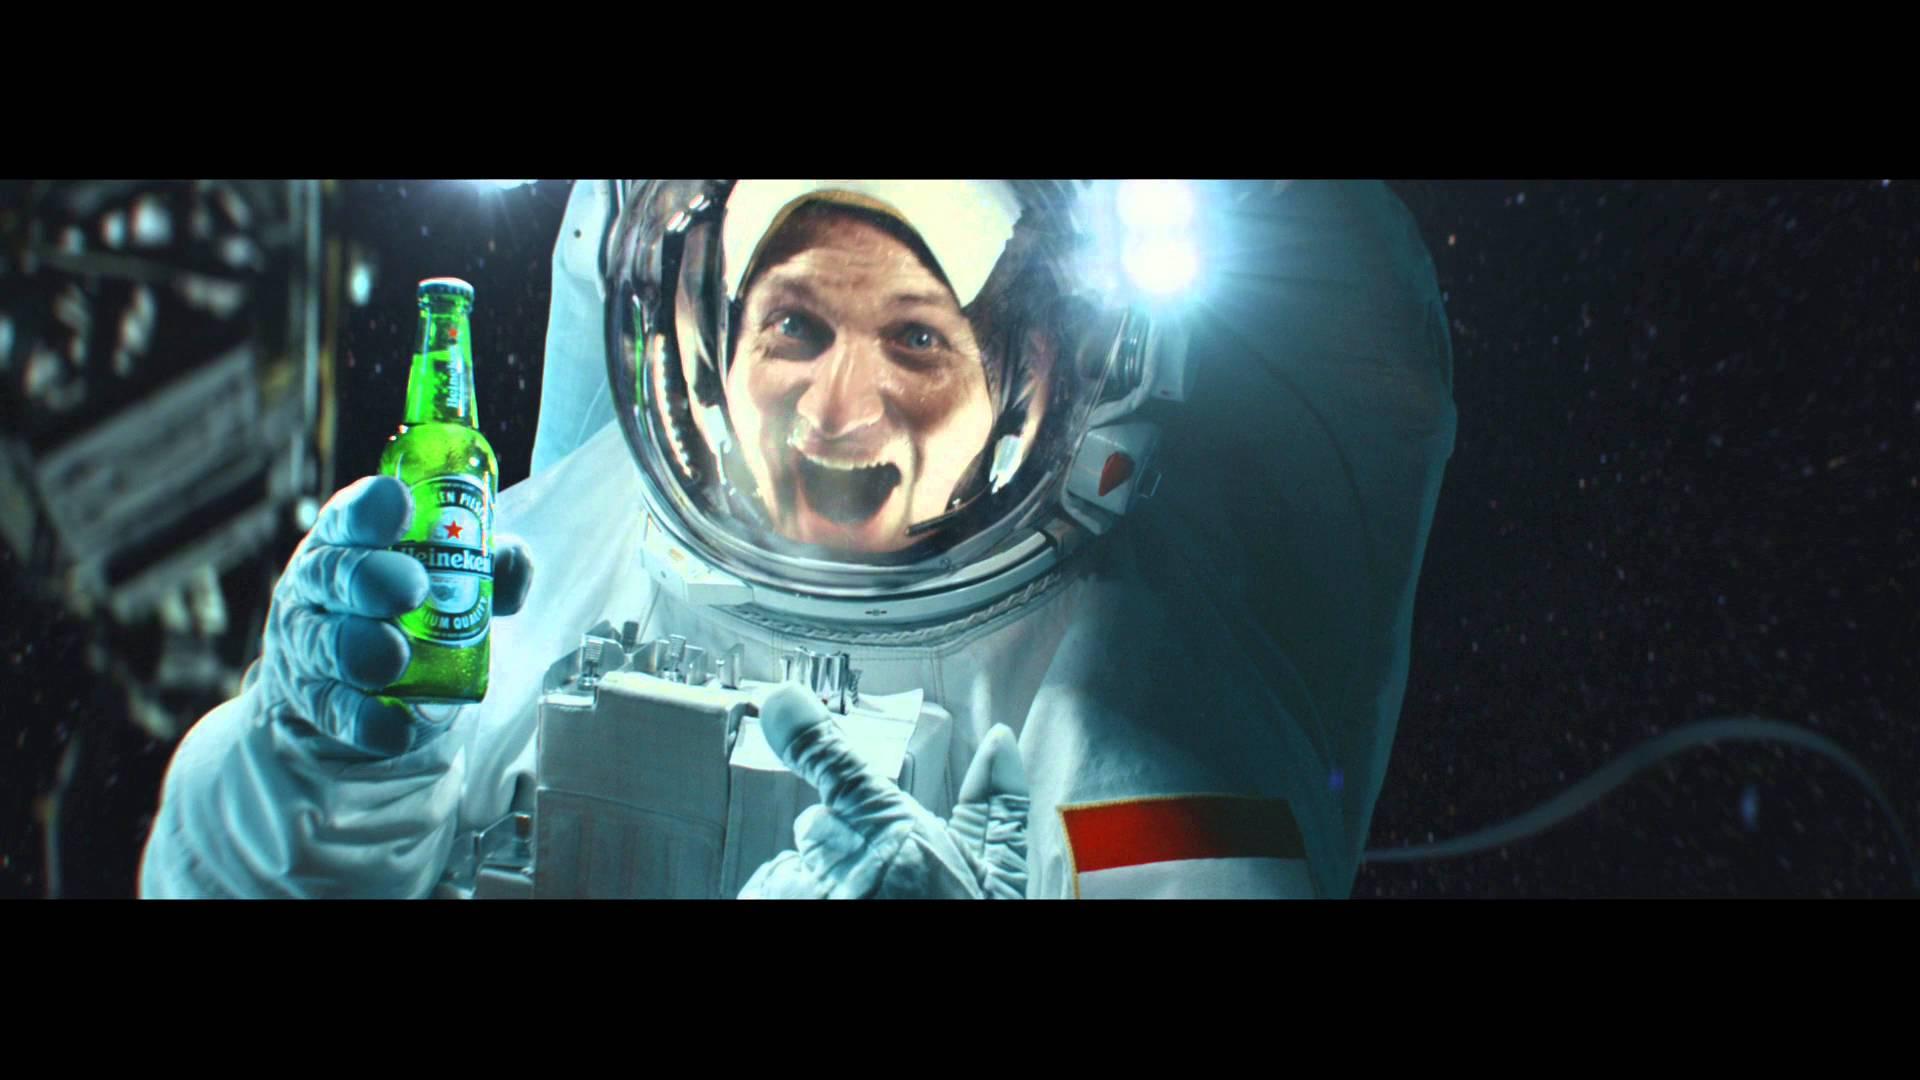 Heineken Christmas Commercial 2020 Song In Heineken Commercial 2020 Christmas | Psywps